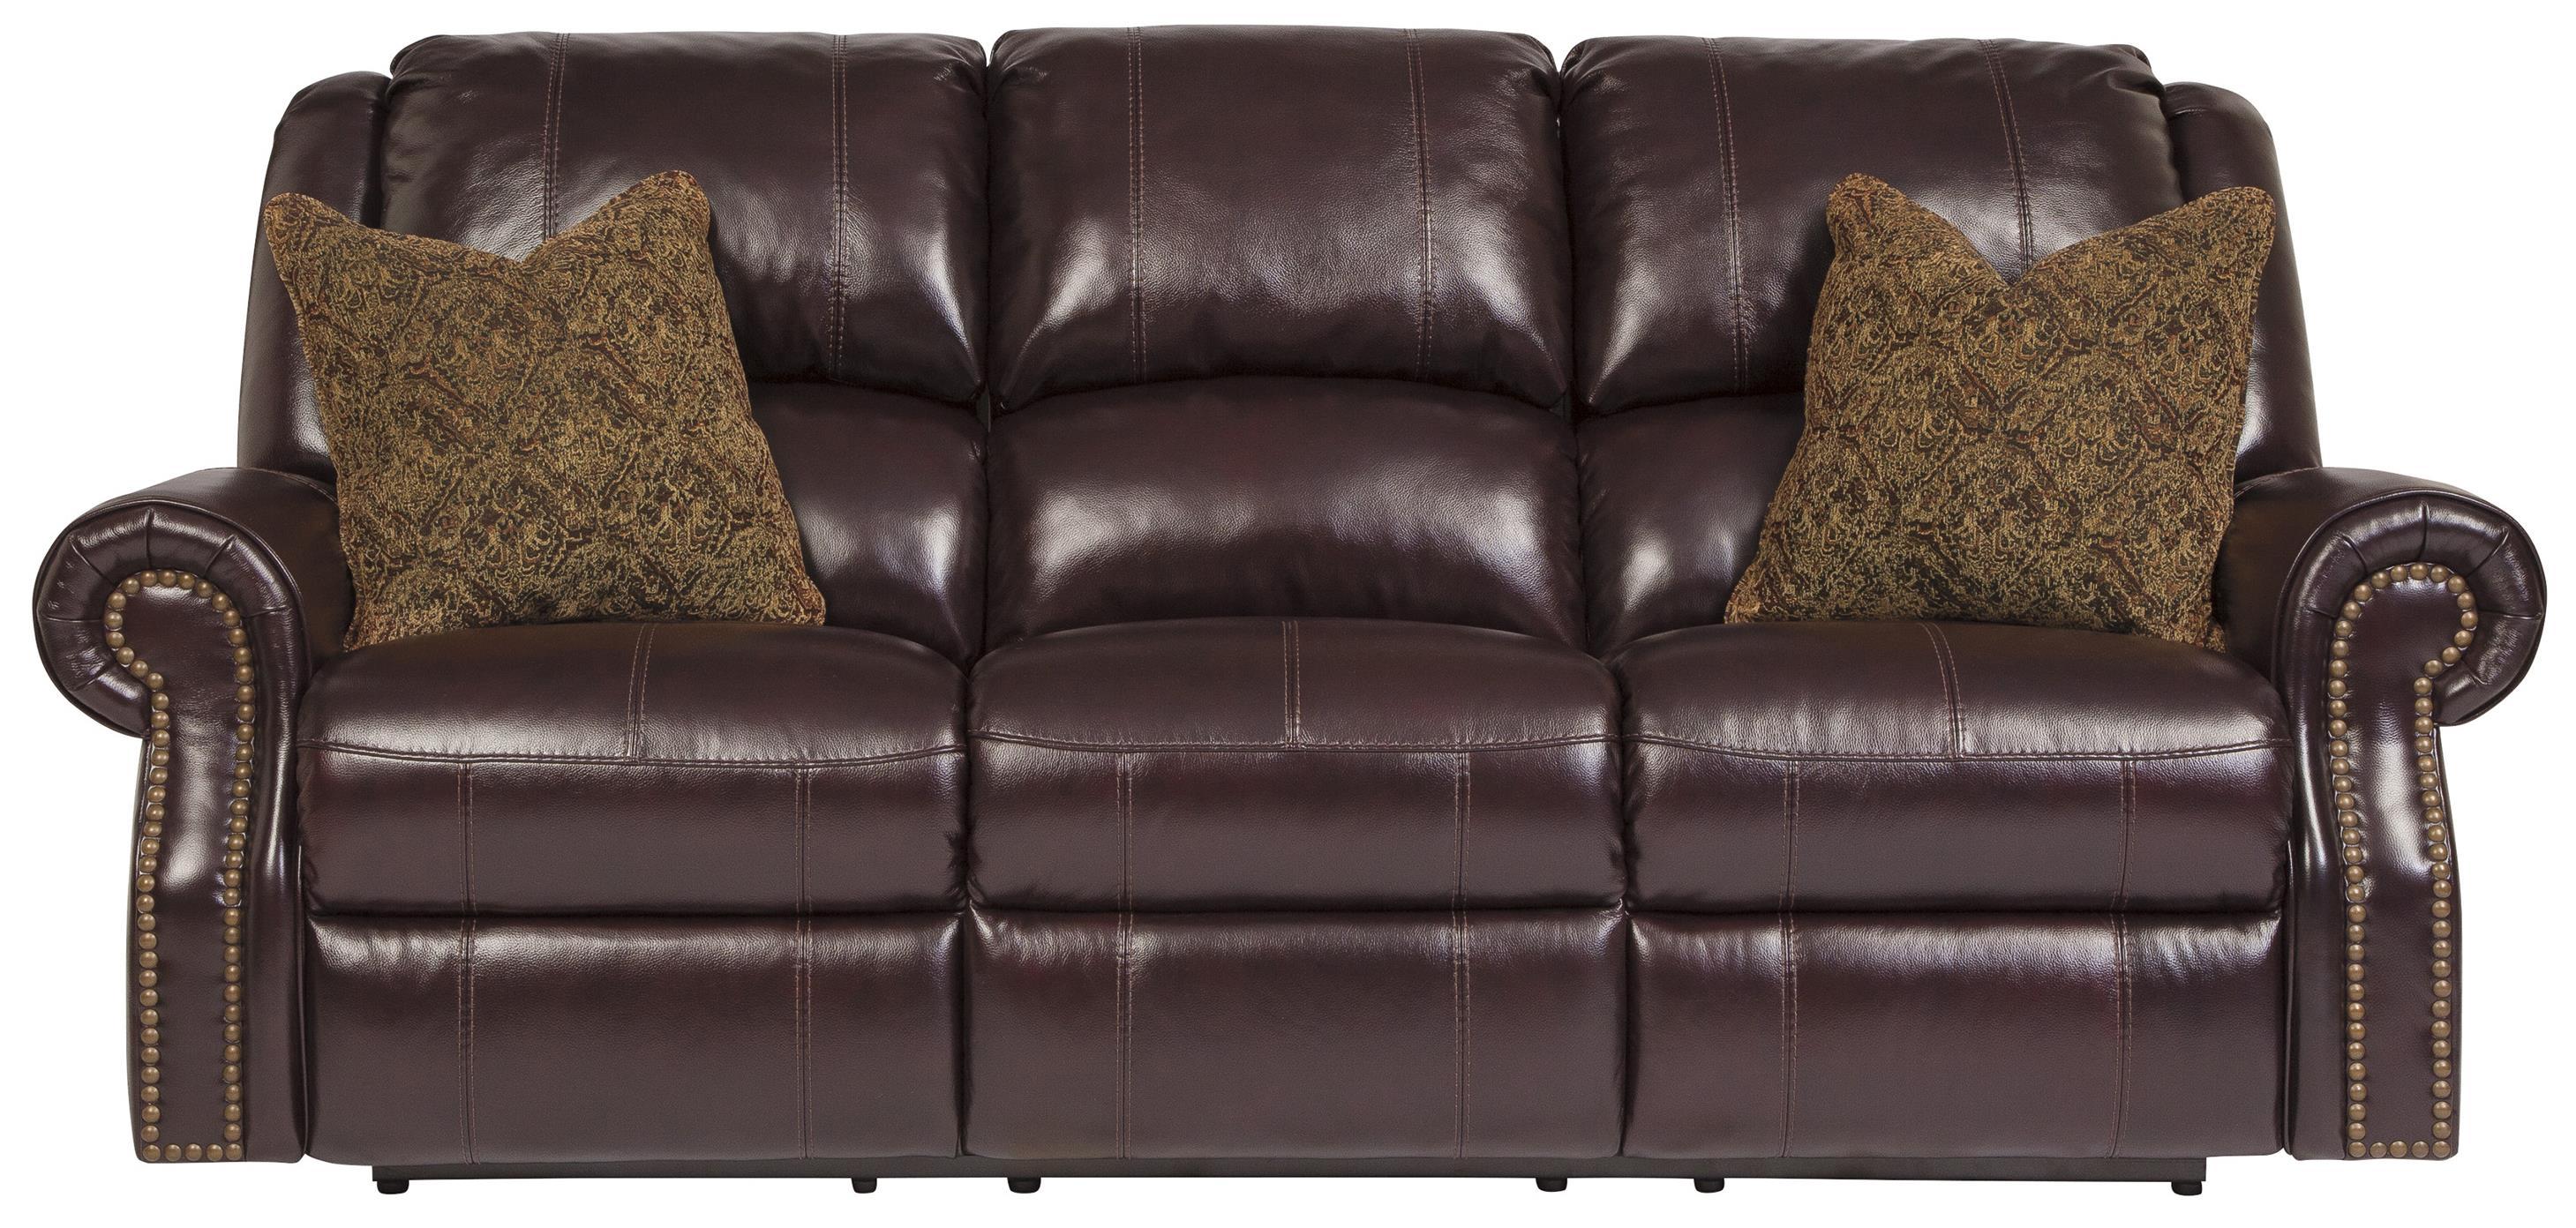 Signature Design By Ashley Walworth Reclining Sofa   Item Number: U7800288